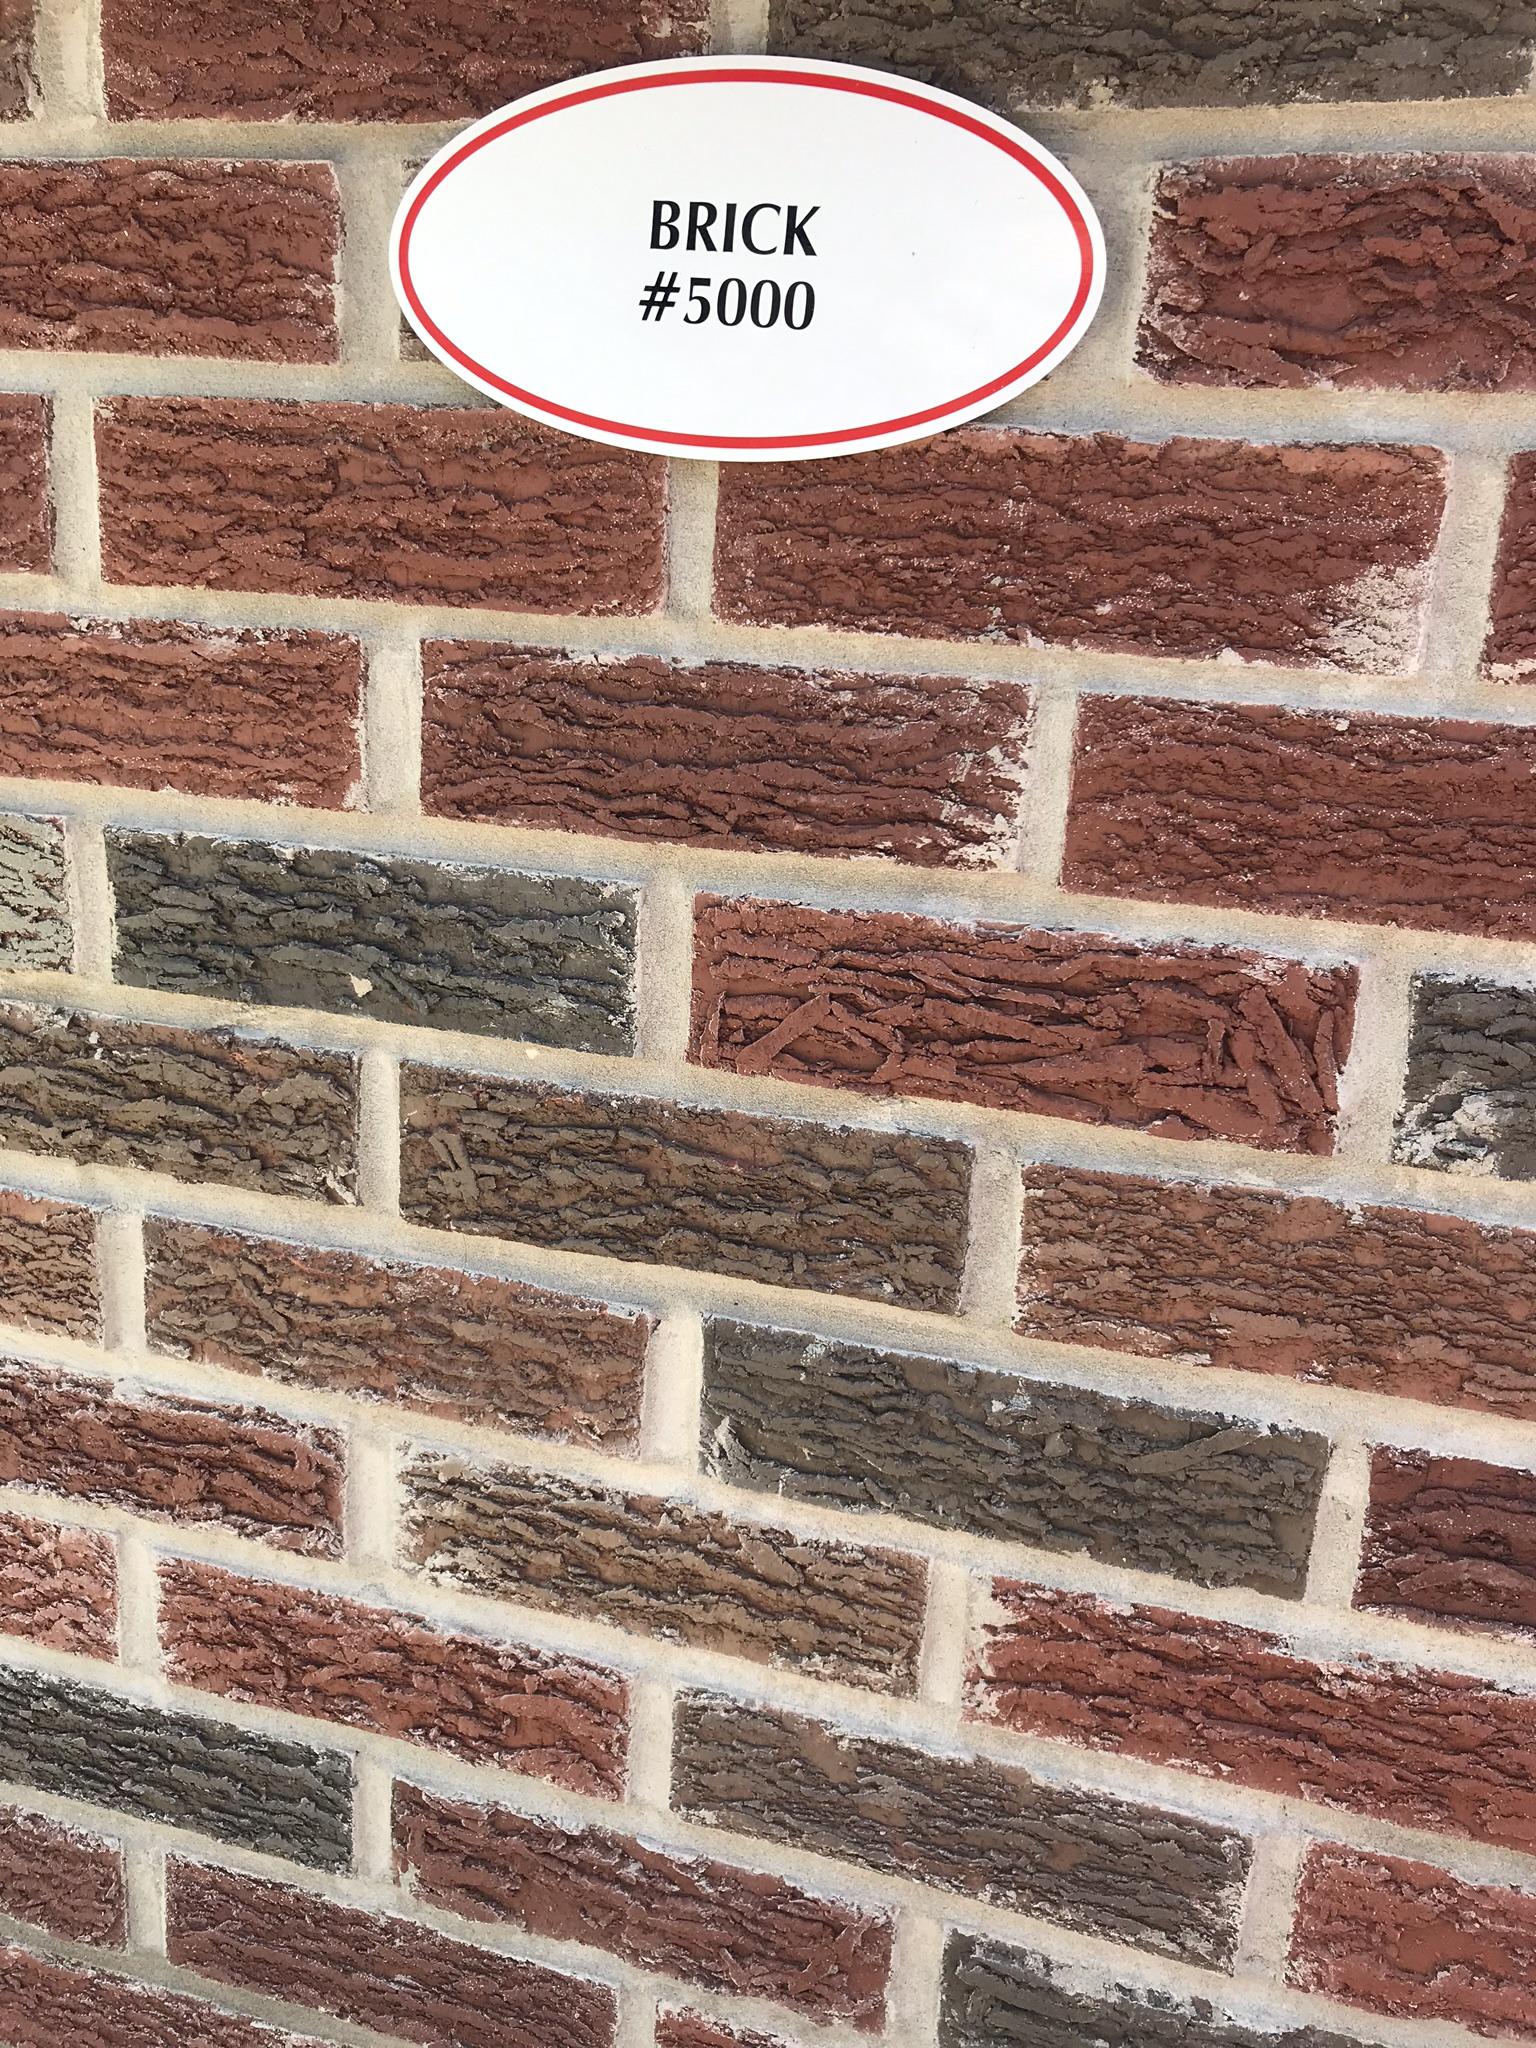 Brick #5000